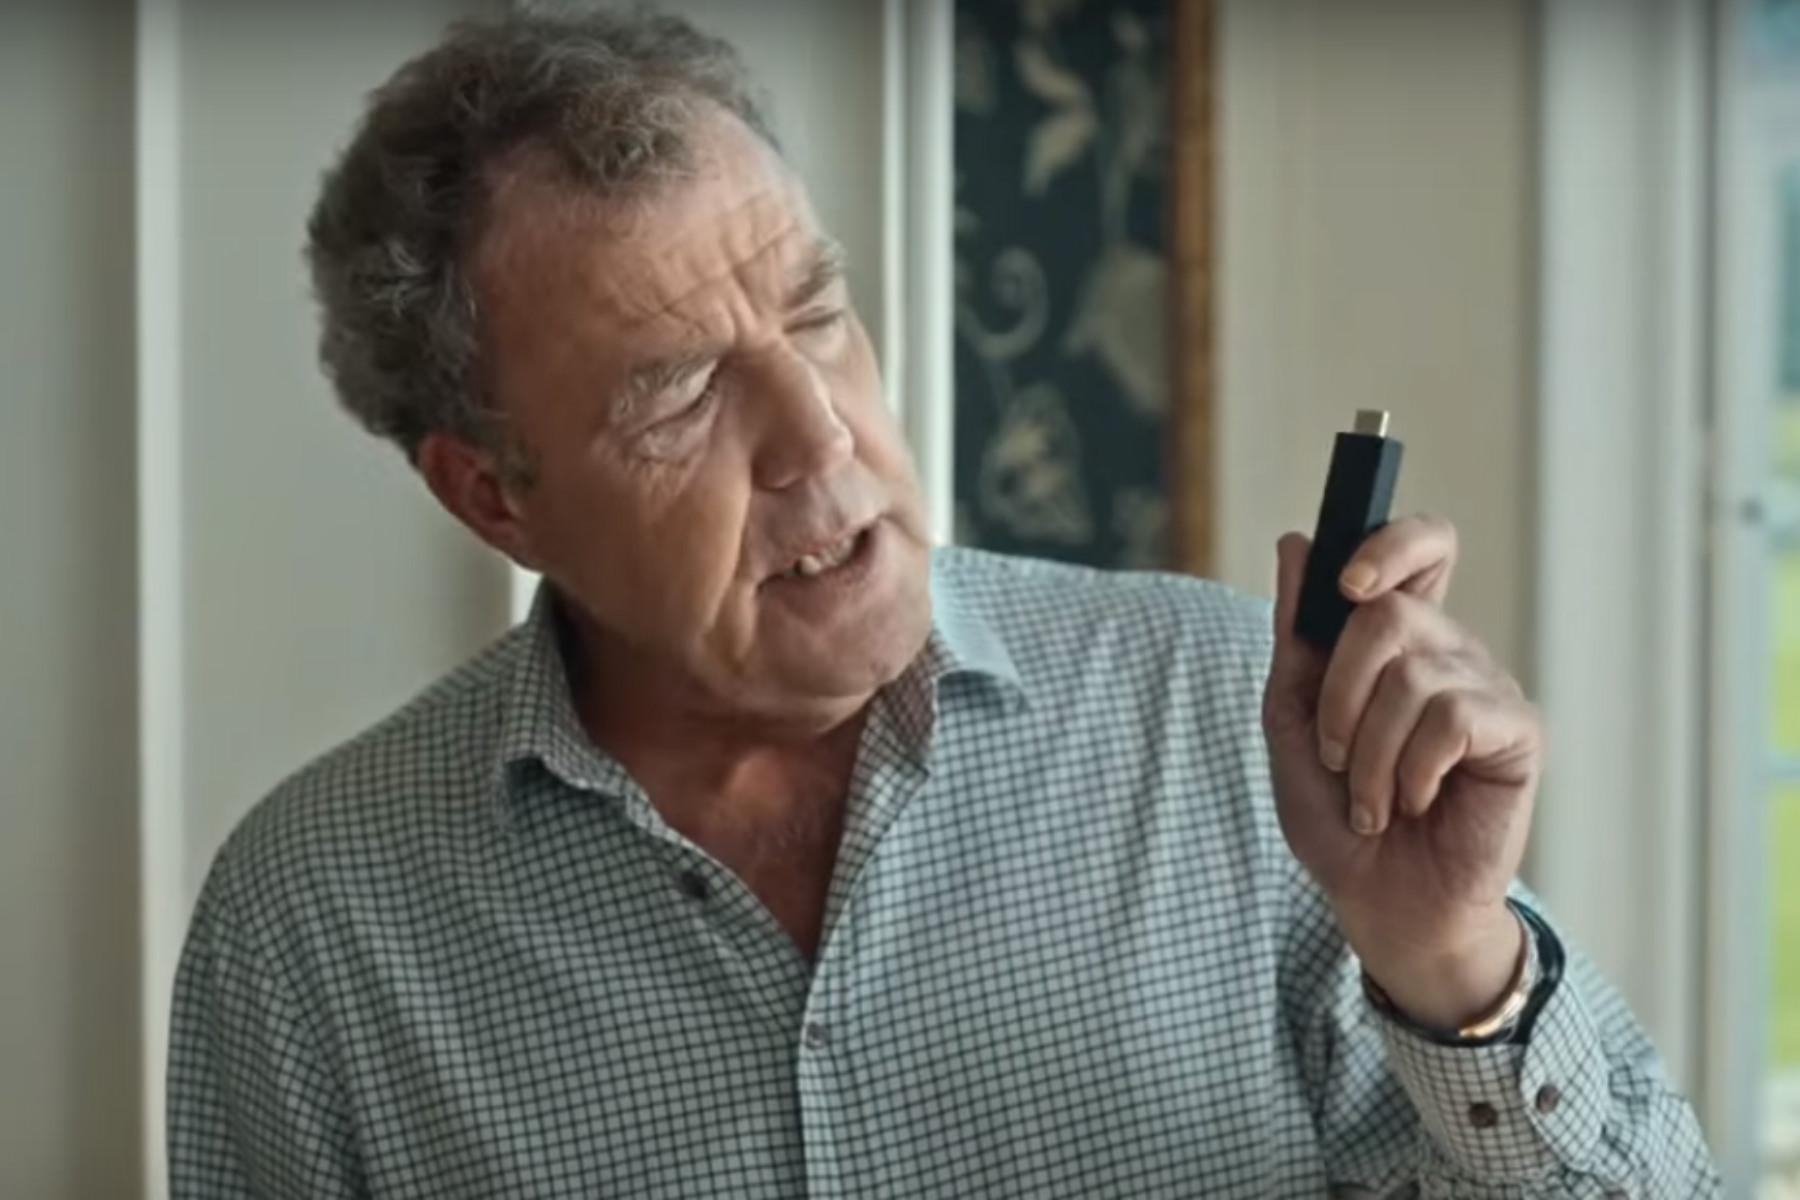 Jeremy Clarkson faces Twitter backlash over Amazon Fire TV advert